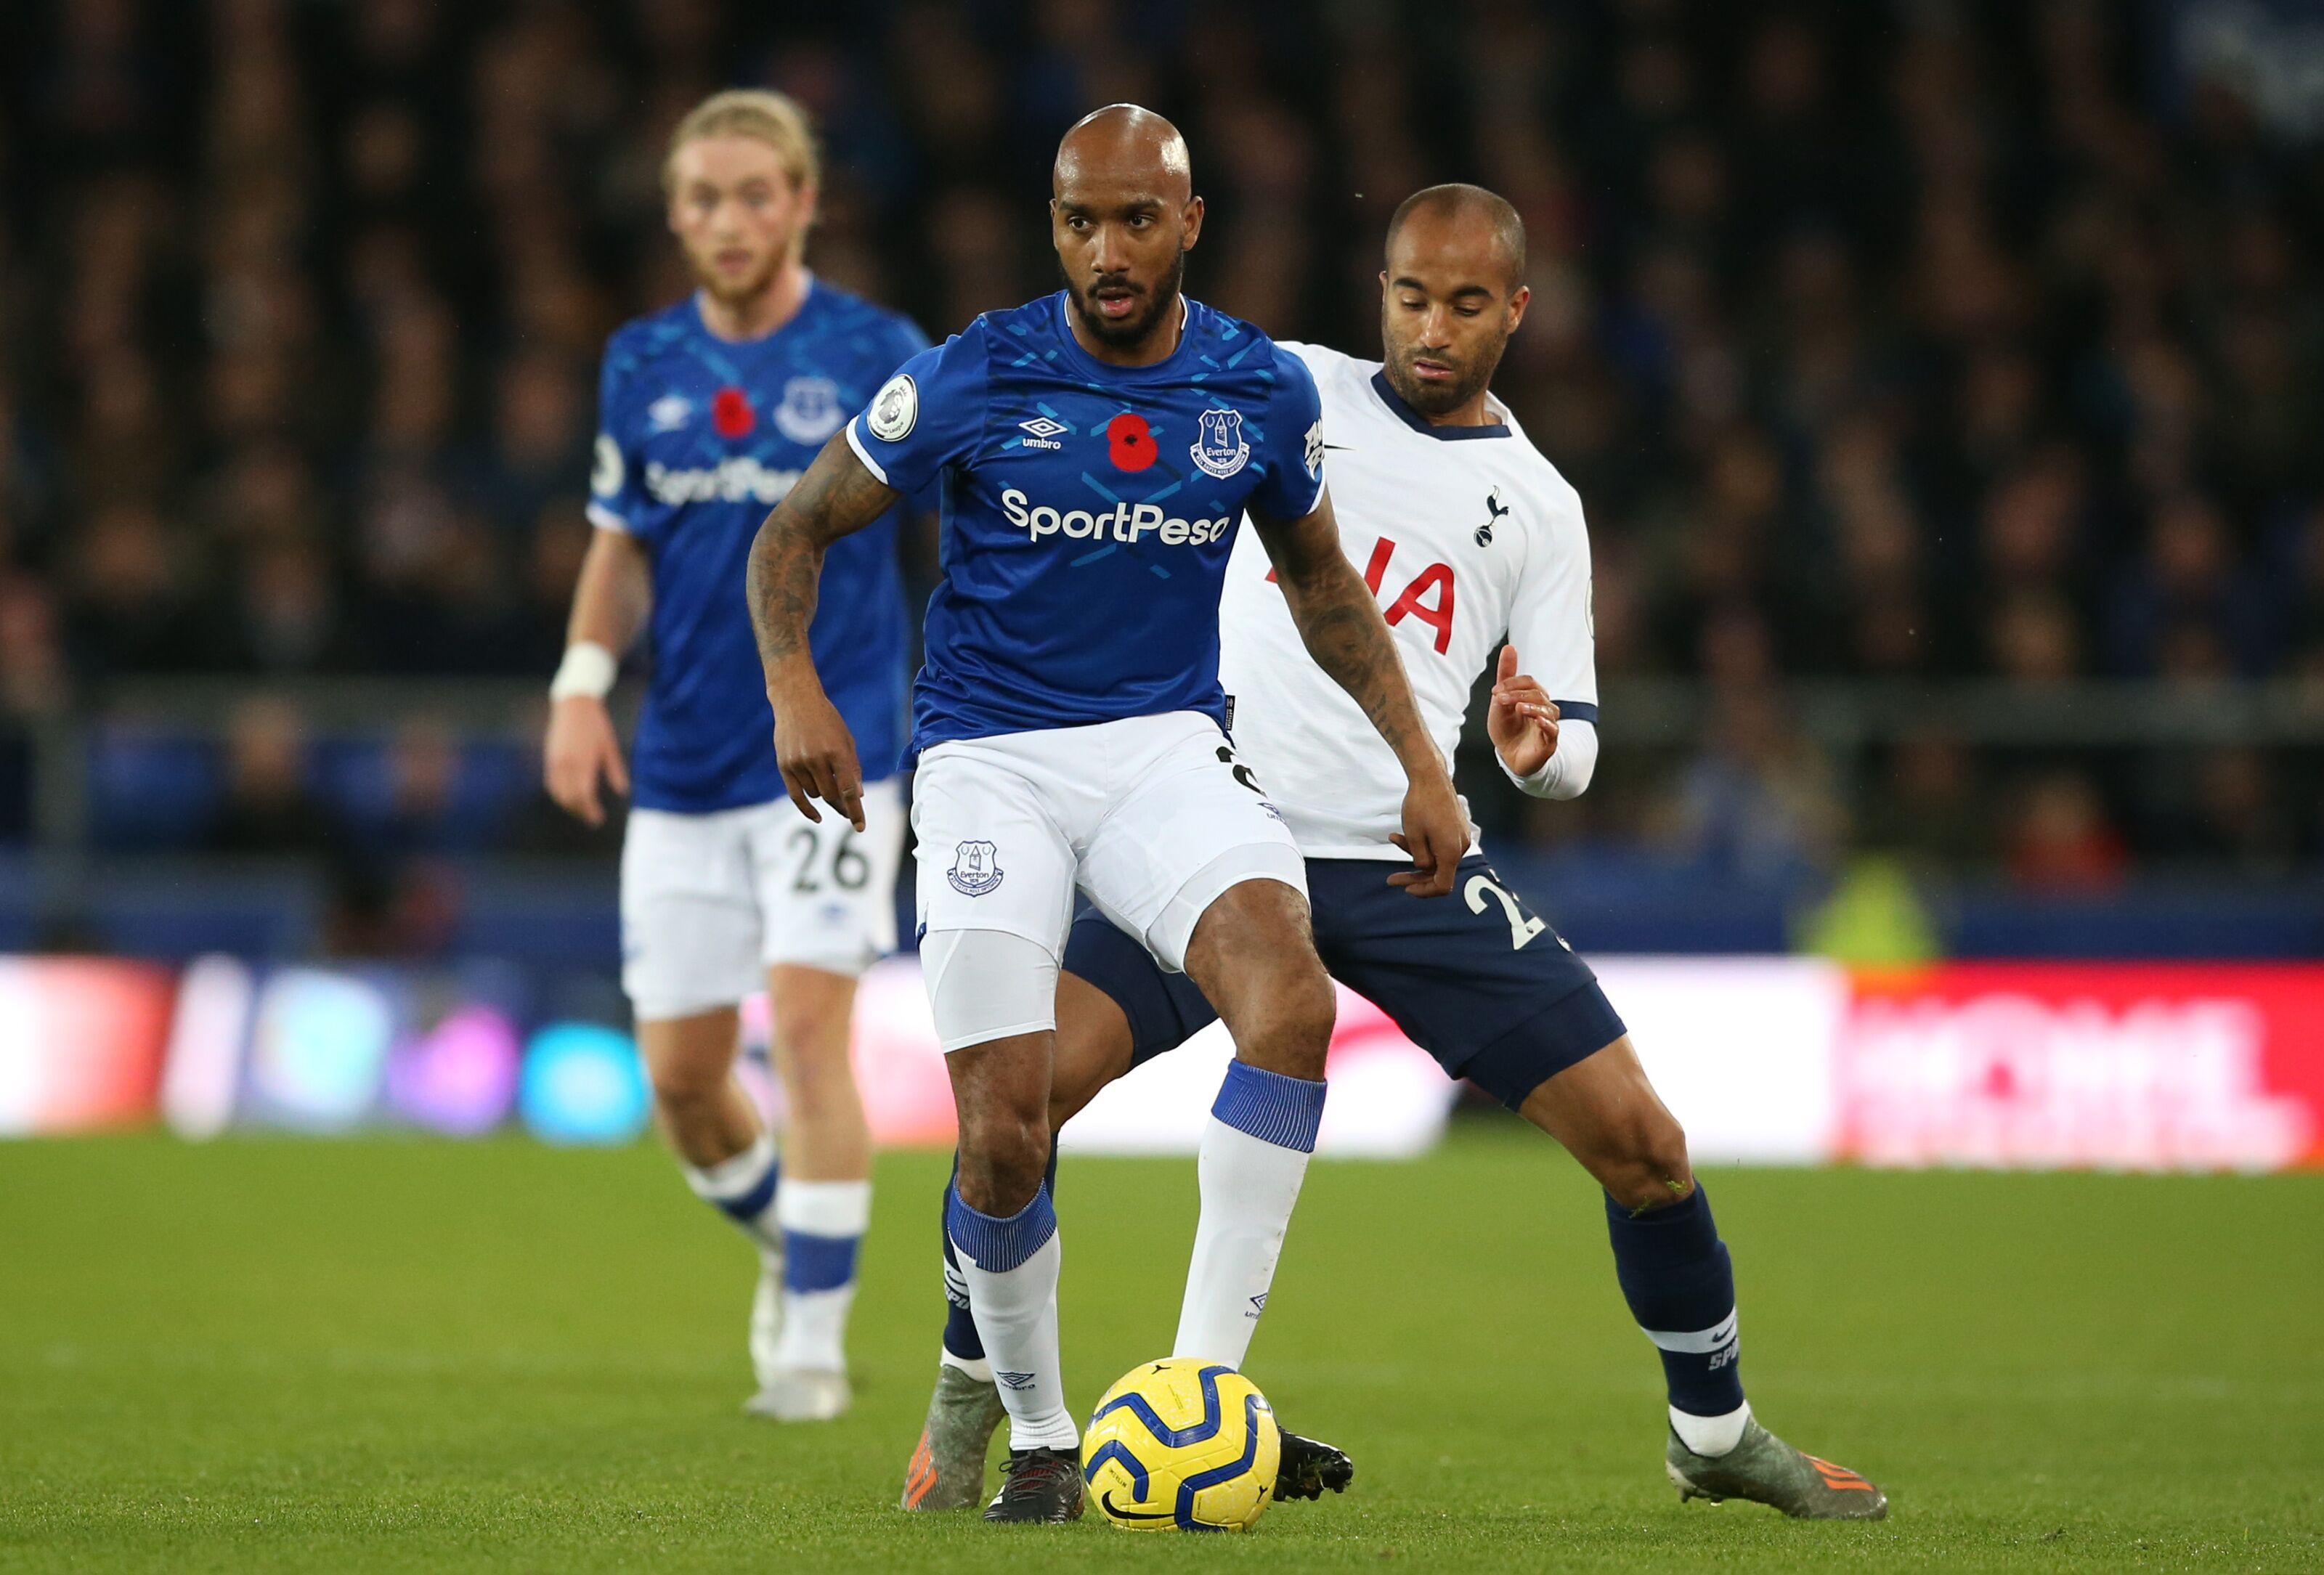 Everton midfielder Delph doubt for Saints game - Prince Rupert's Tower